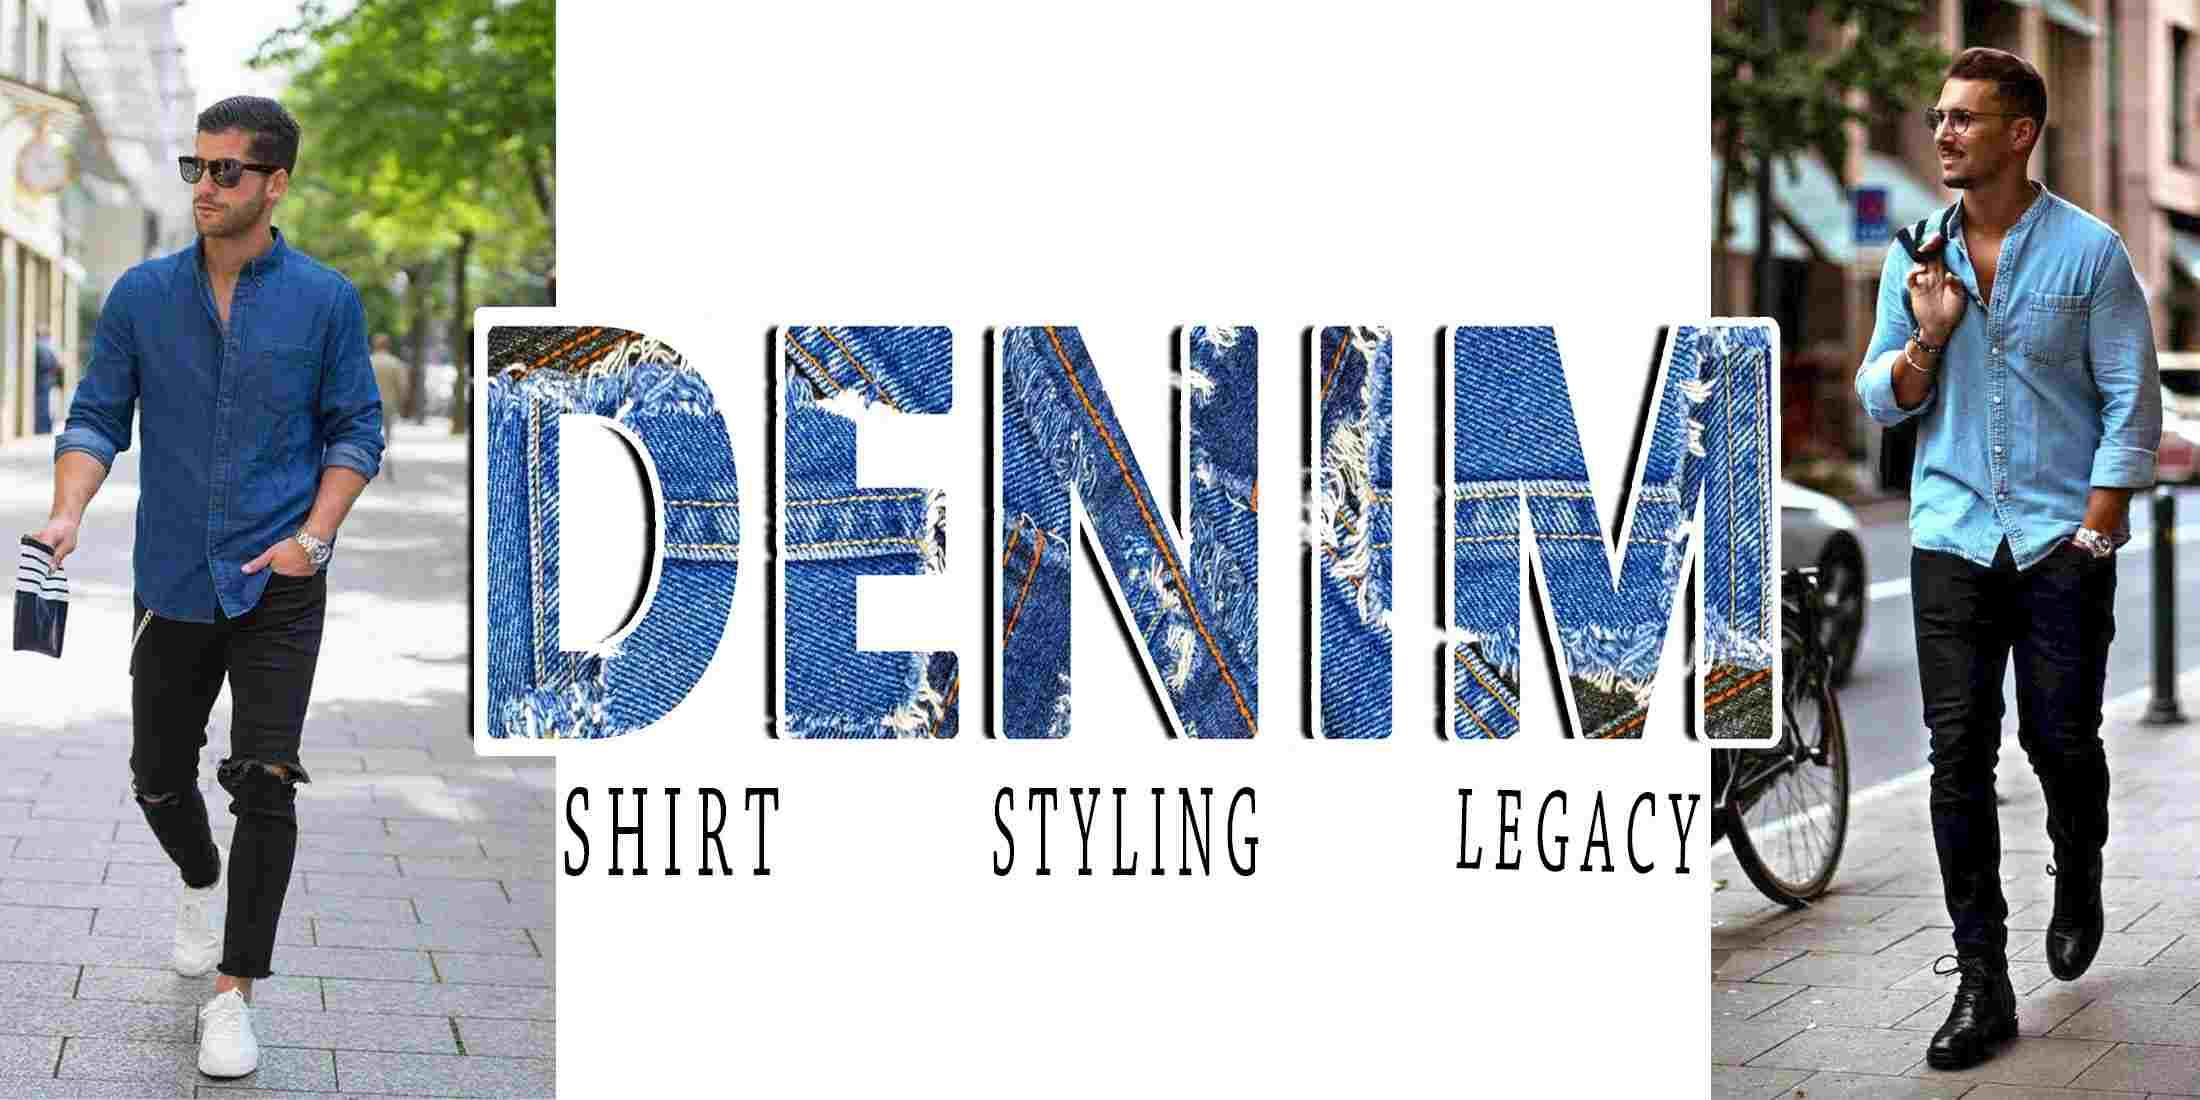 How to Wear Denim Shirt in 2020